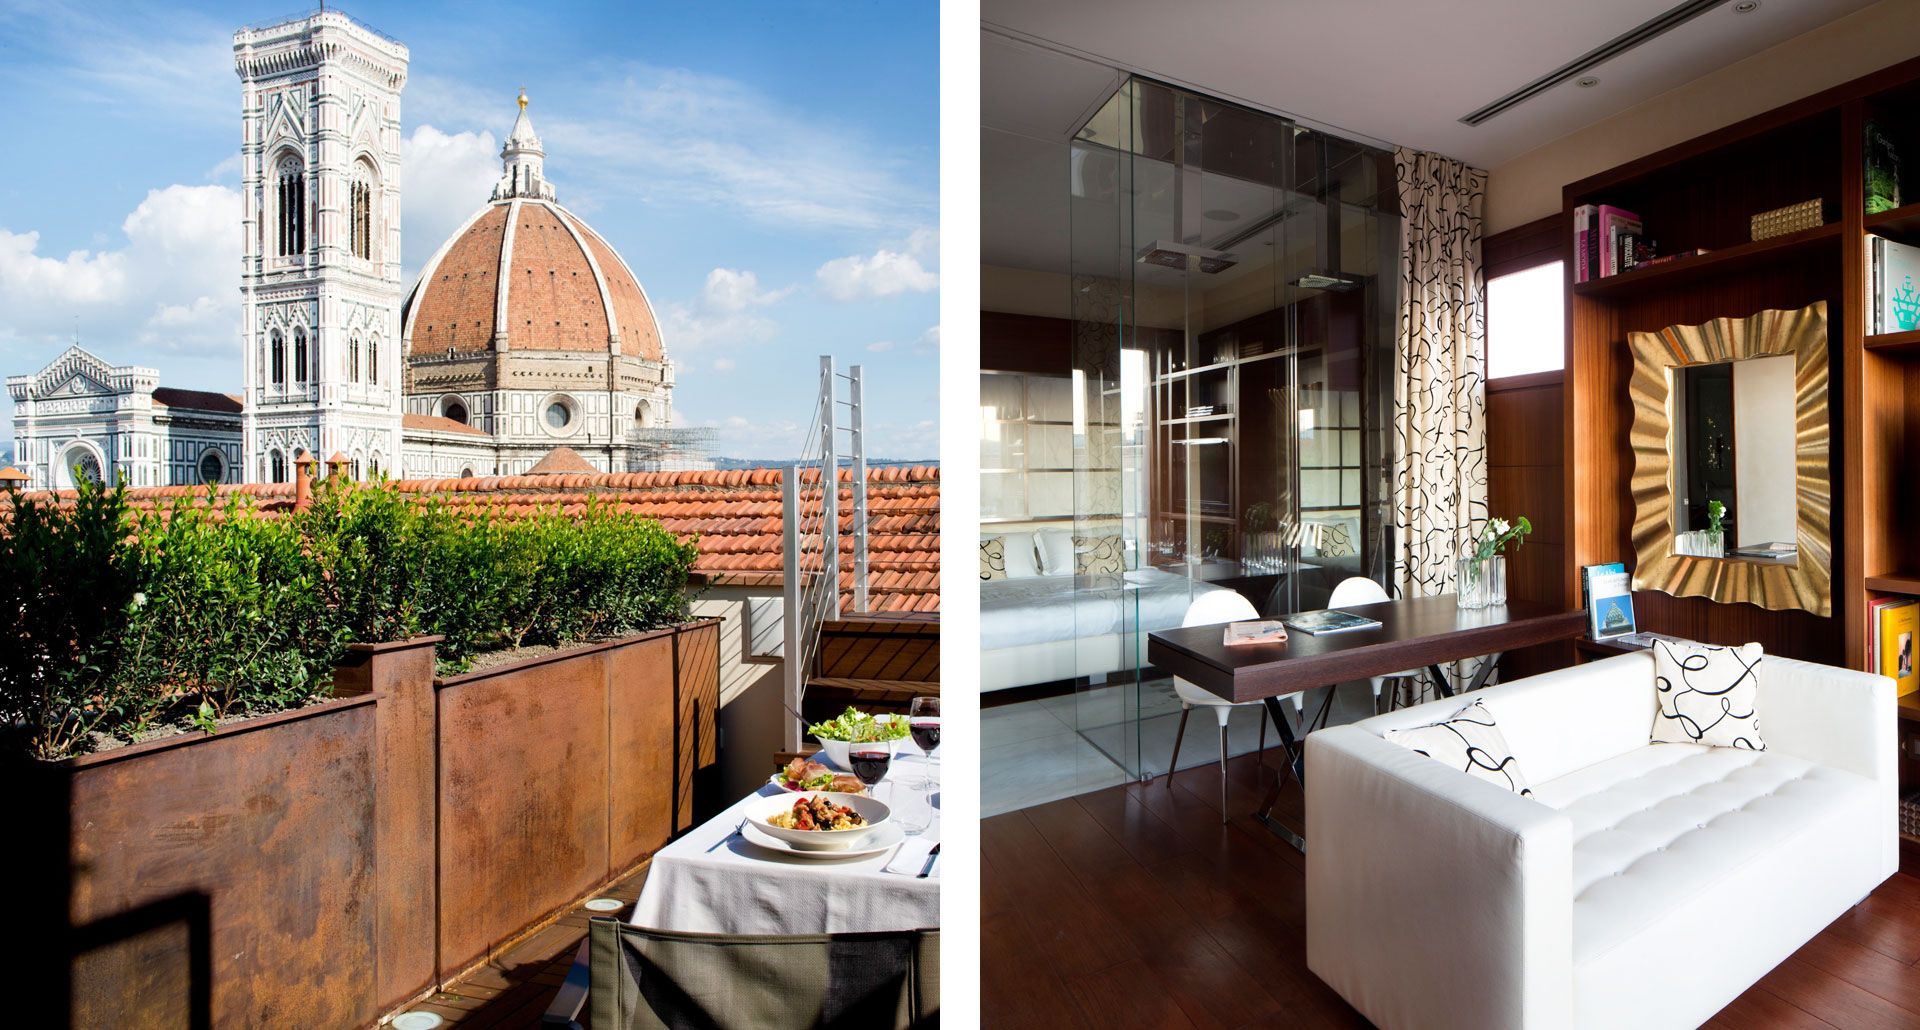 Domux Home Repubblica - boutique hotel in Florence